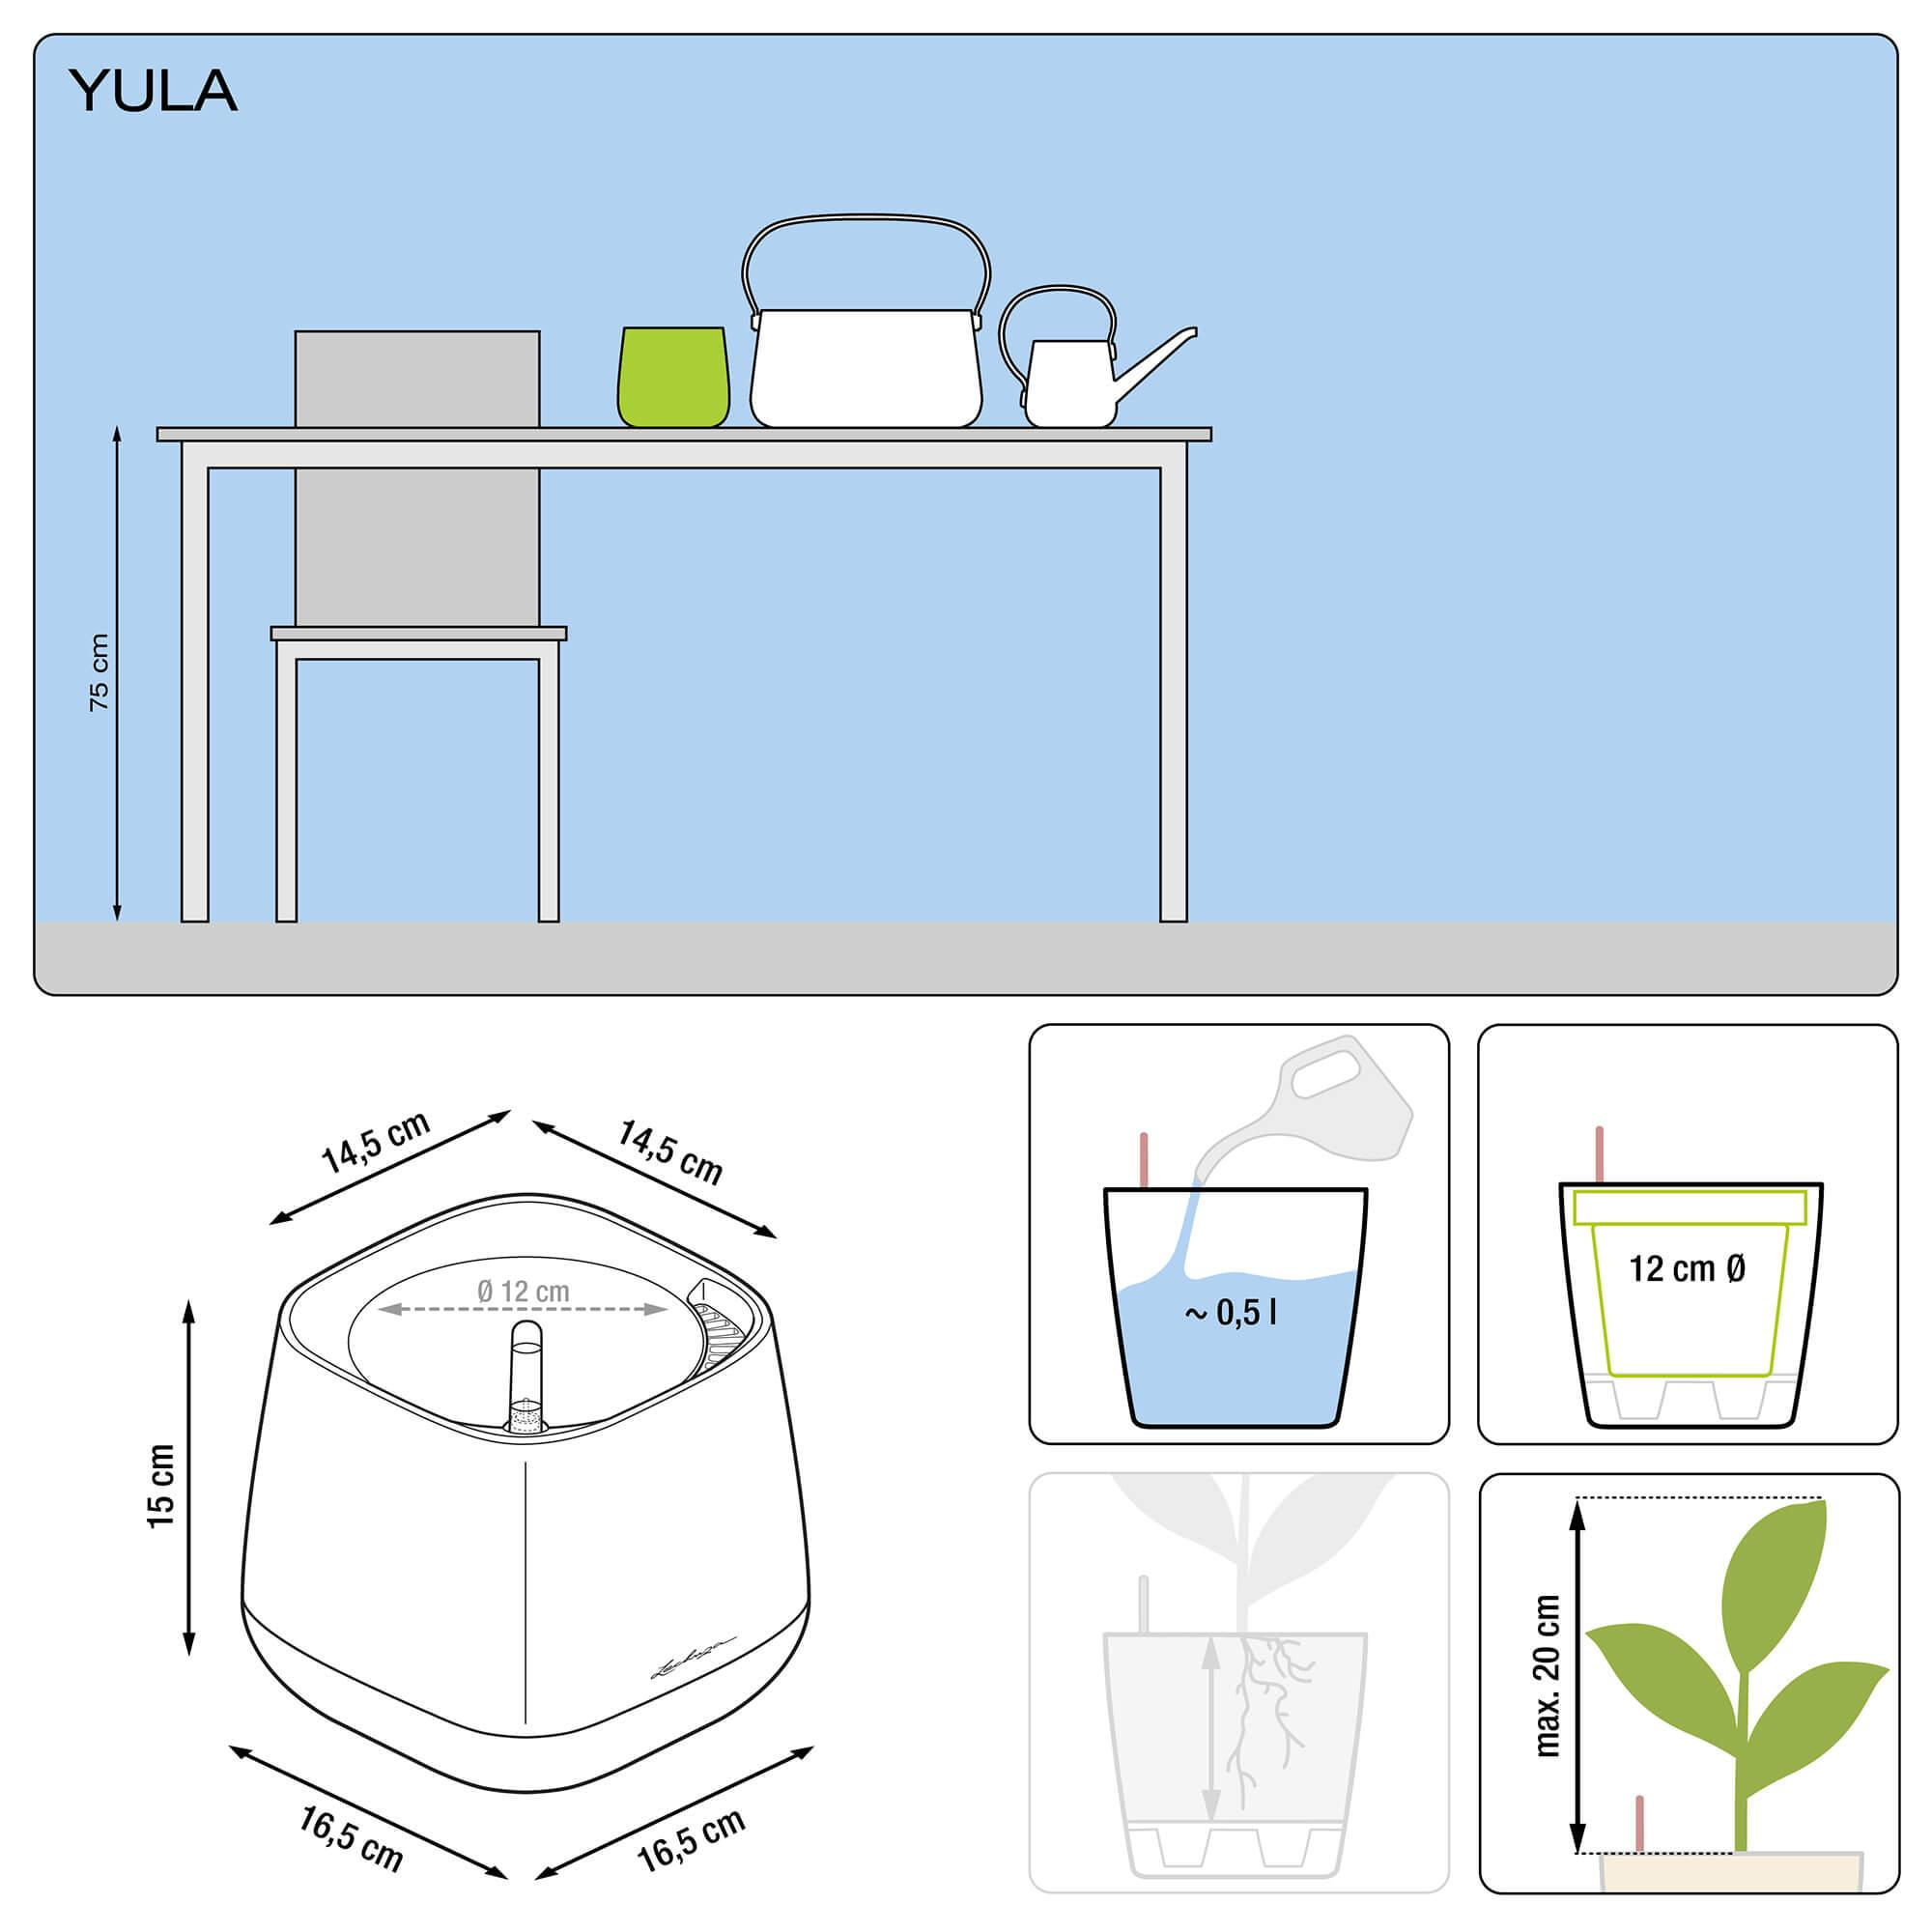 YULA Pflanzgefäß weiß/grau seidenmatt - Bild 2